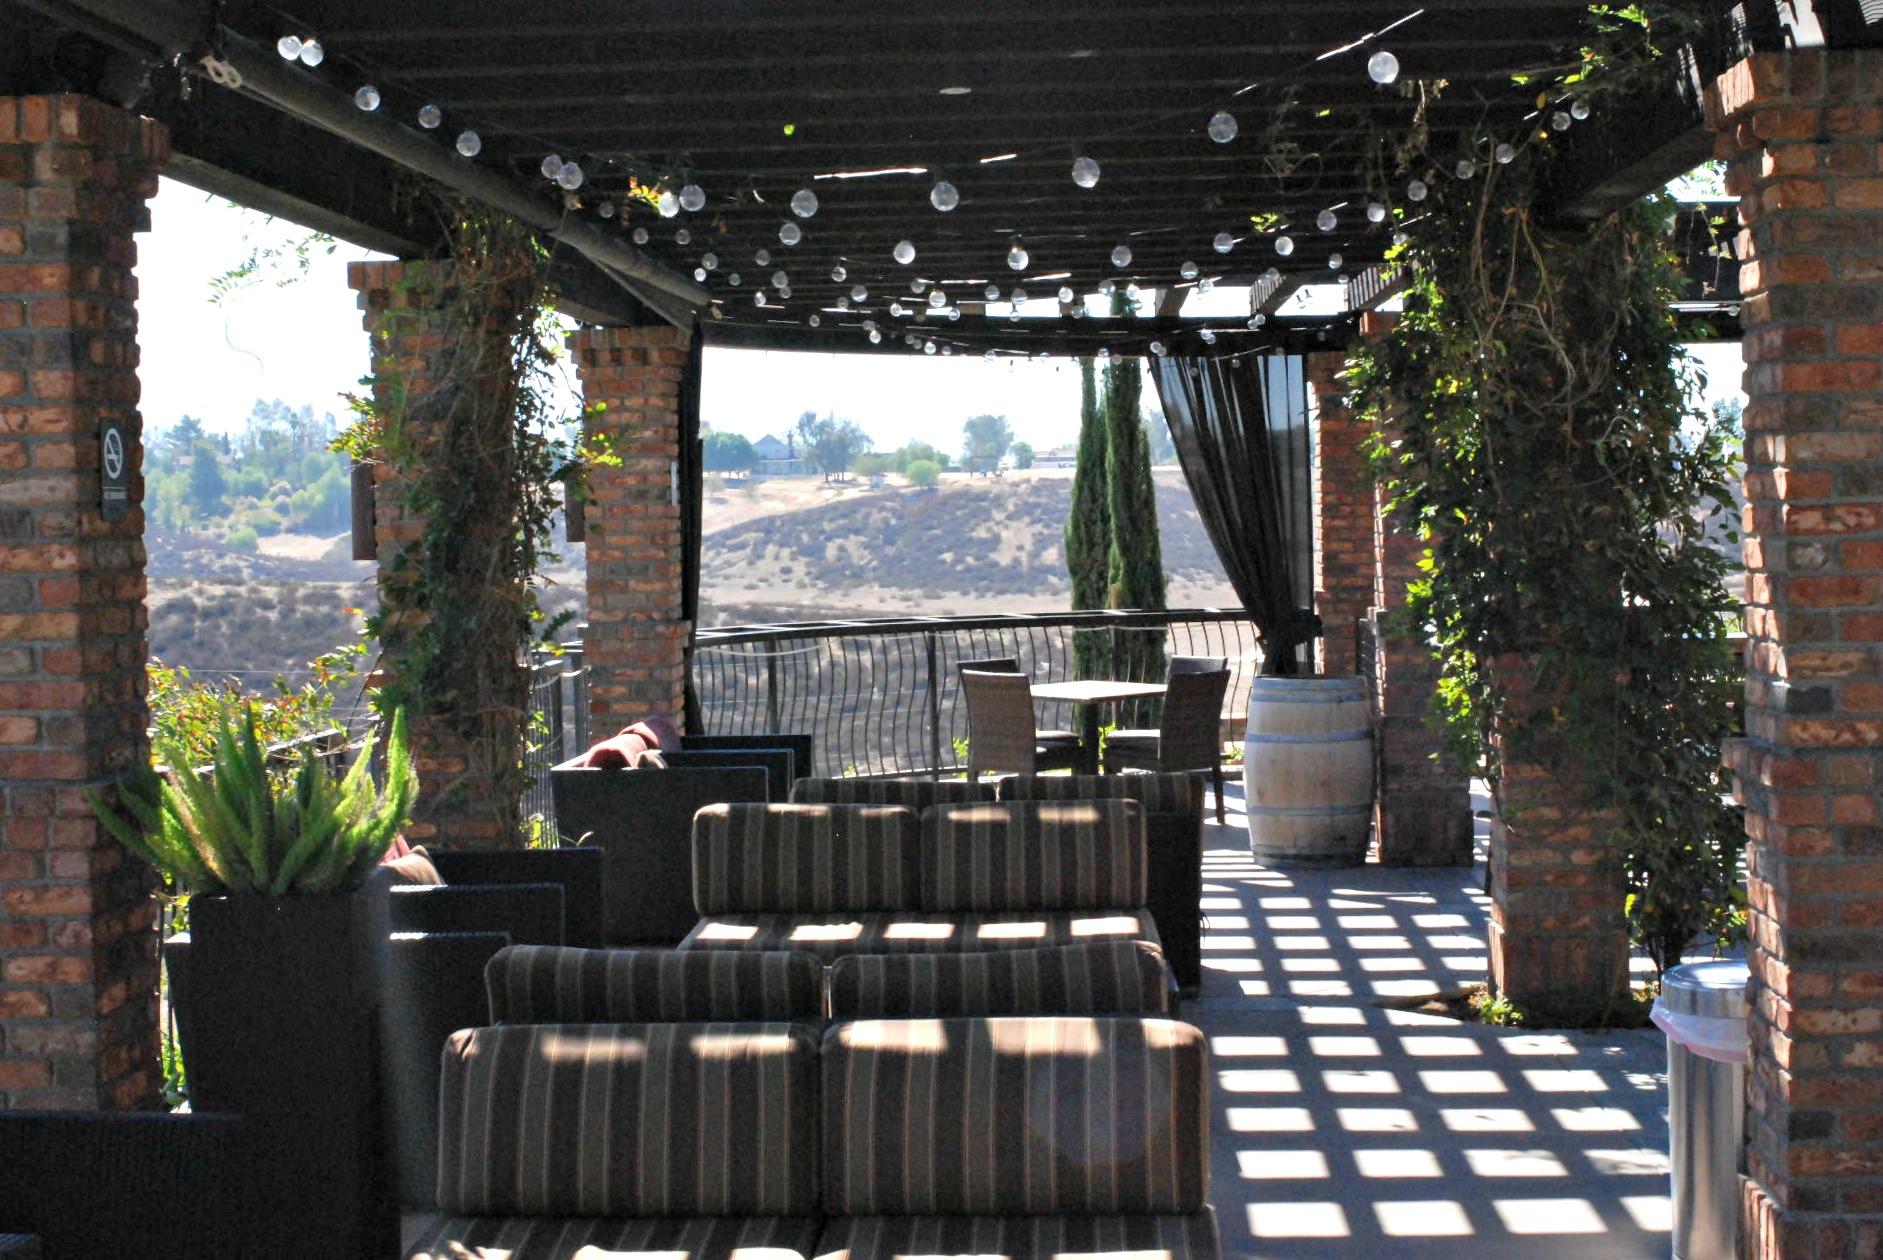 Miramonte outdoor seating area